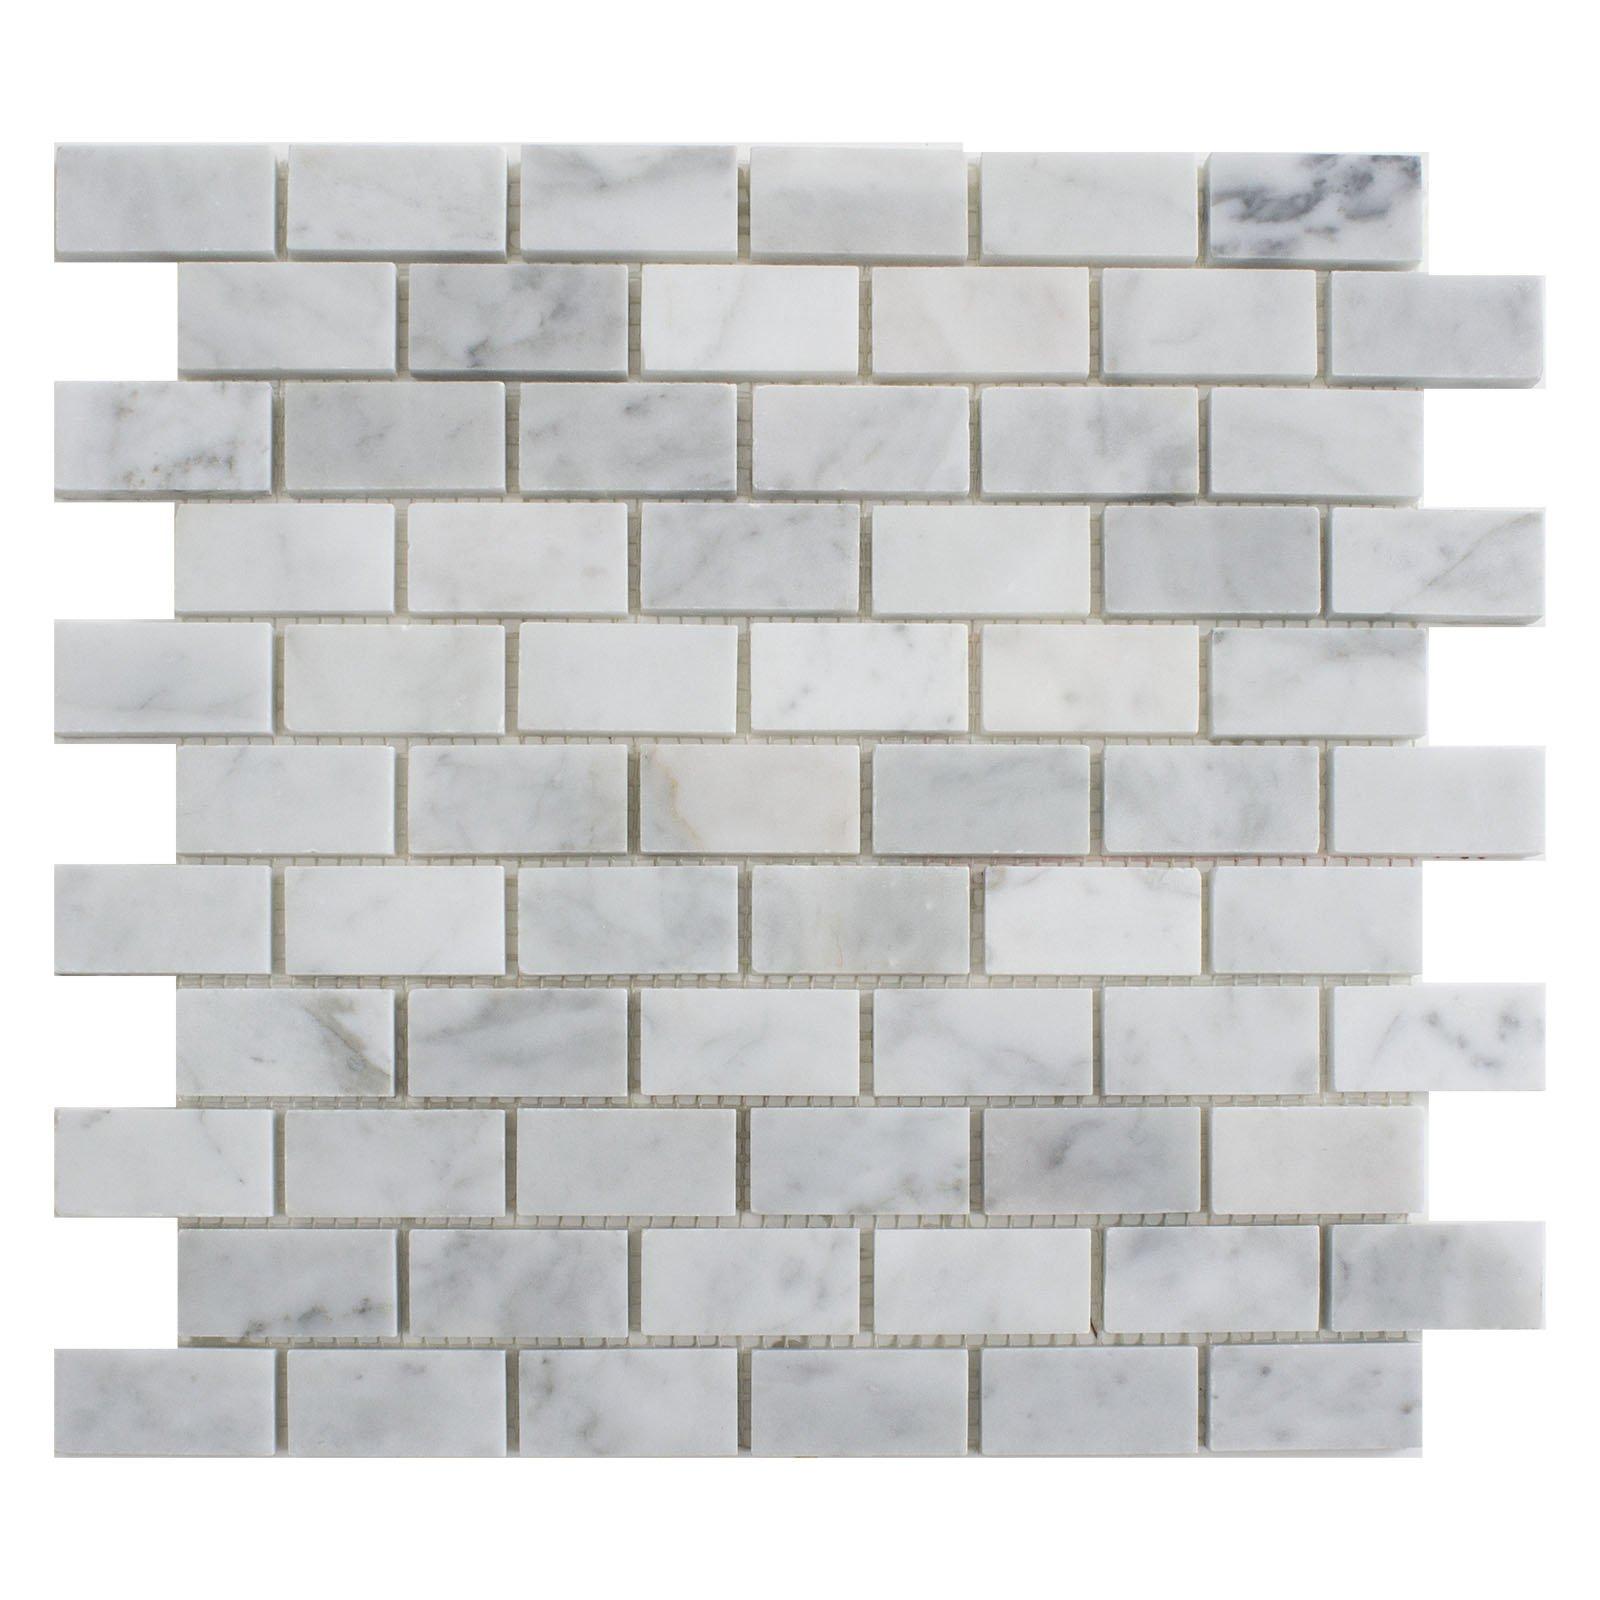 Carrara White Marble Mosaic Tile, CWMM0102-H, Chip Size 1''X2'' Brick, 12''X12''X5/16, Honed (Box of 5 Sheets)